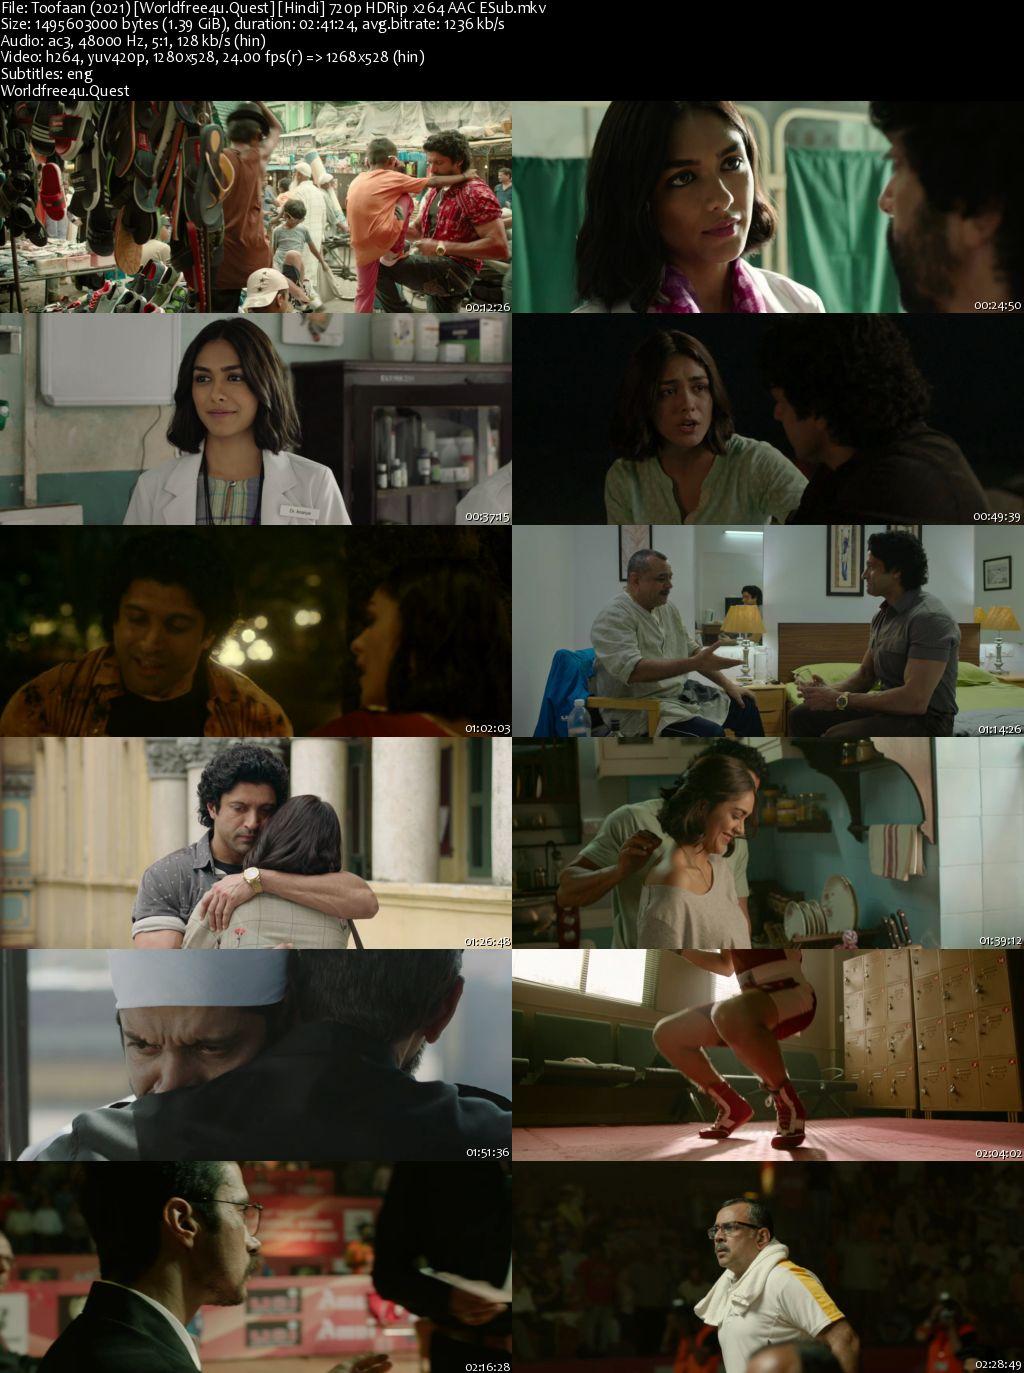 Toofaan 2021 Hindi Movie Download HDRip 720p